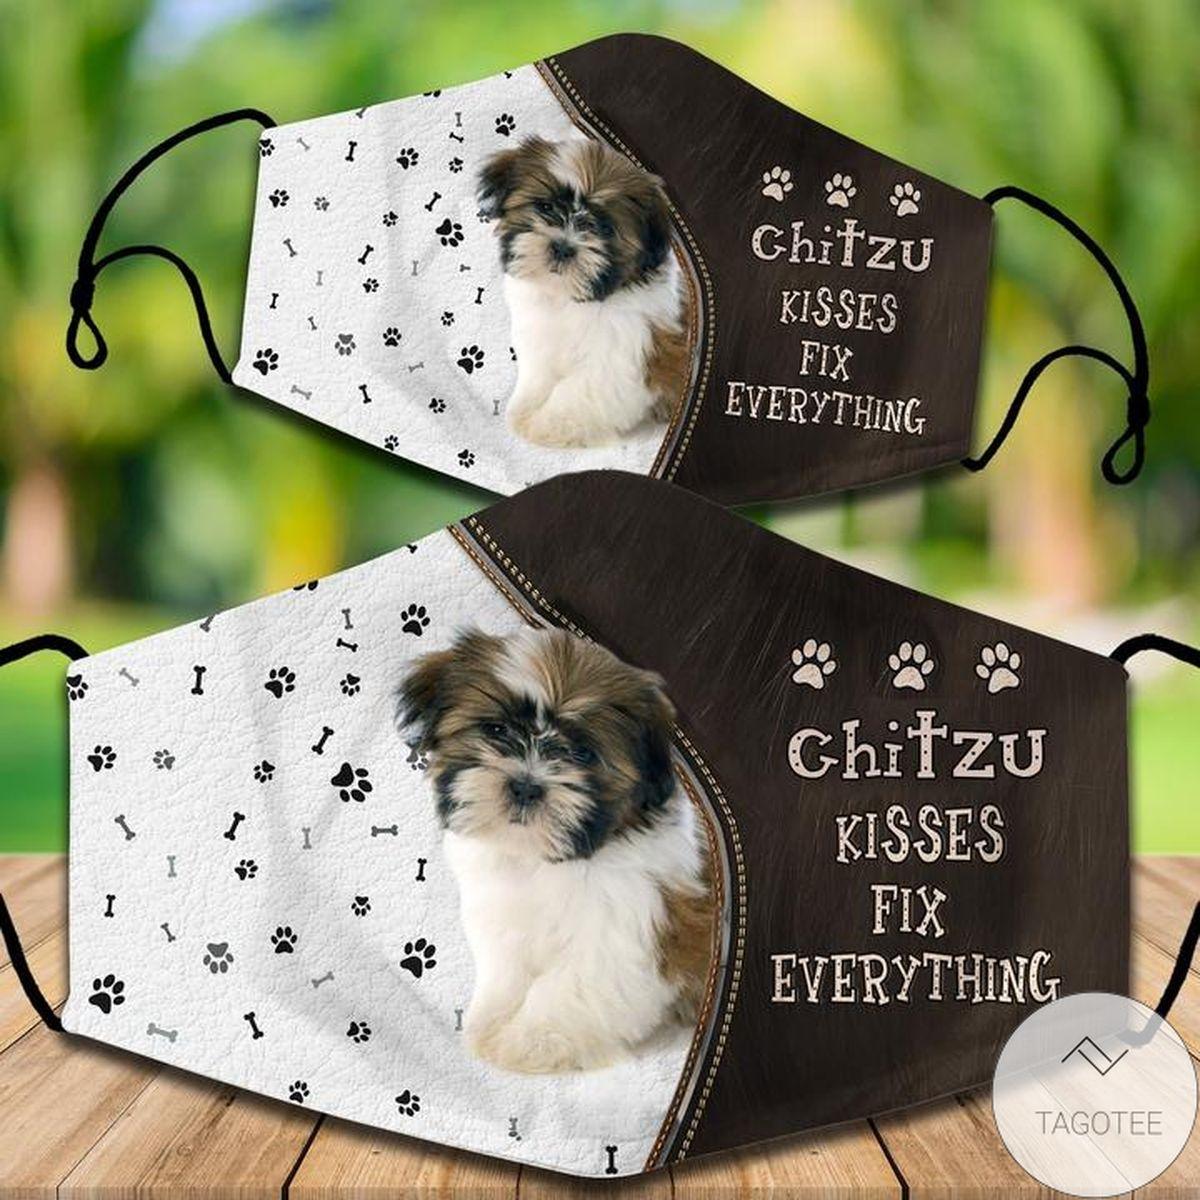 Chitzu Kisses Fix Everything Face Mask